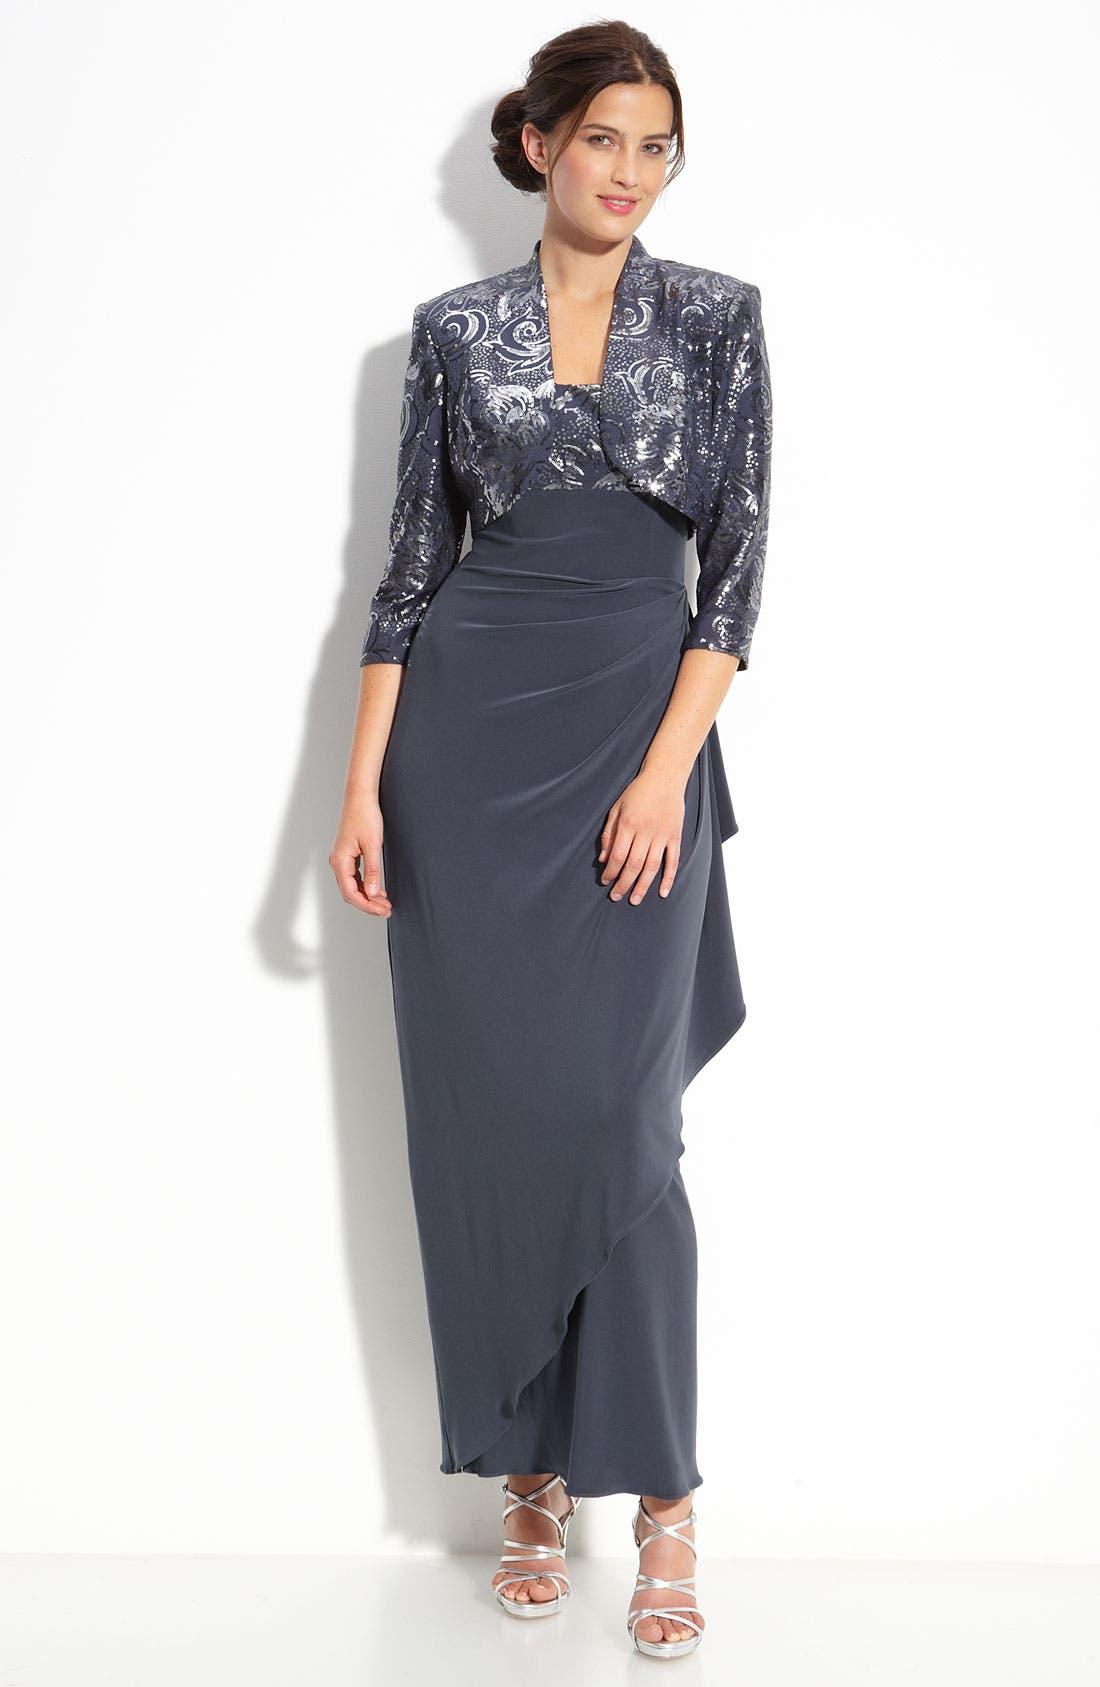 Main Image - Alex Evenings Sequin Jersey Gown & Bolero